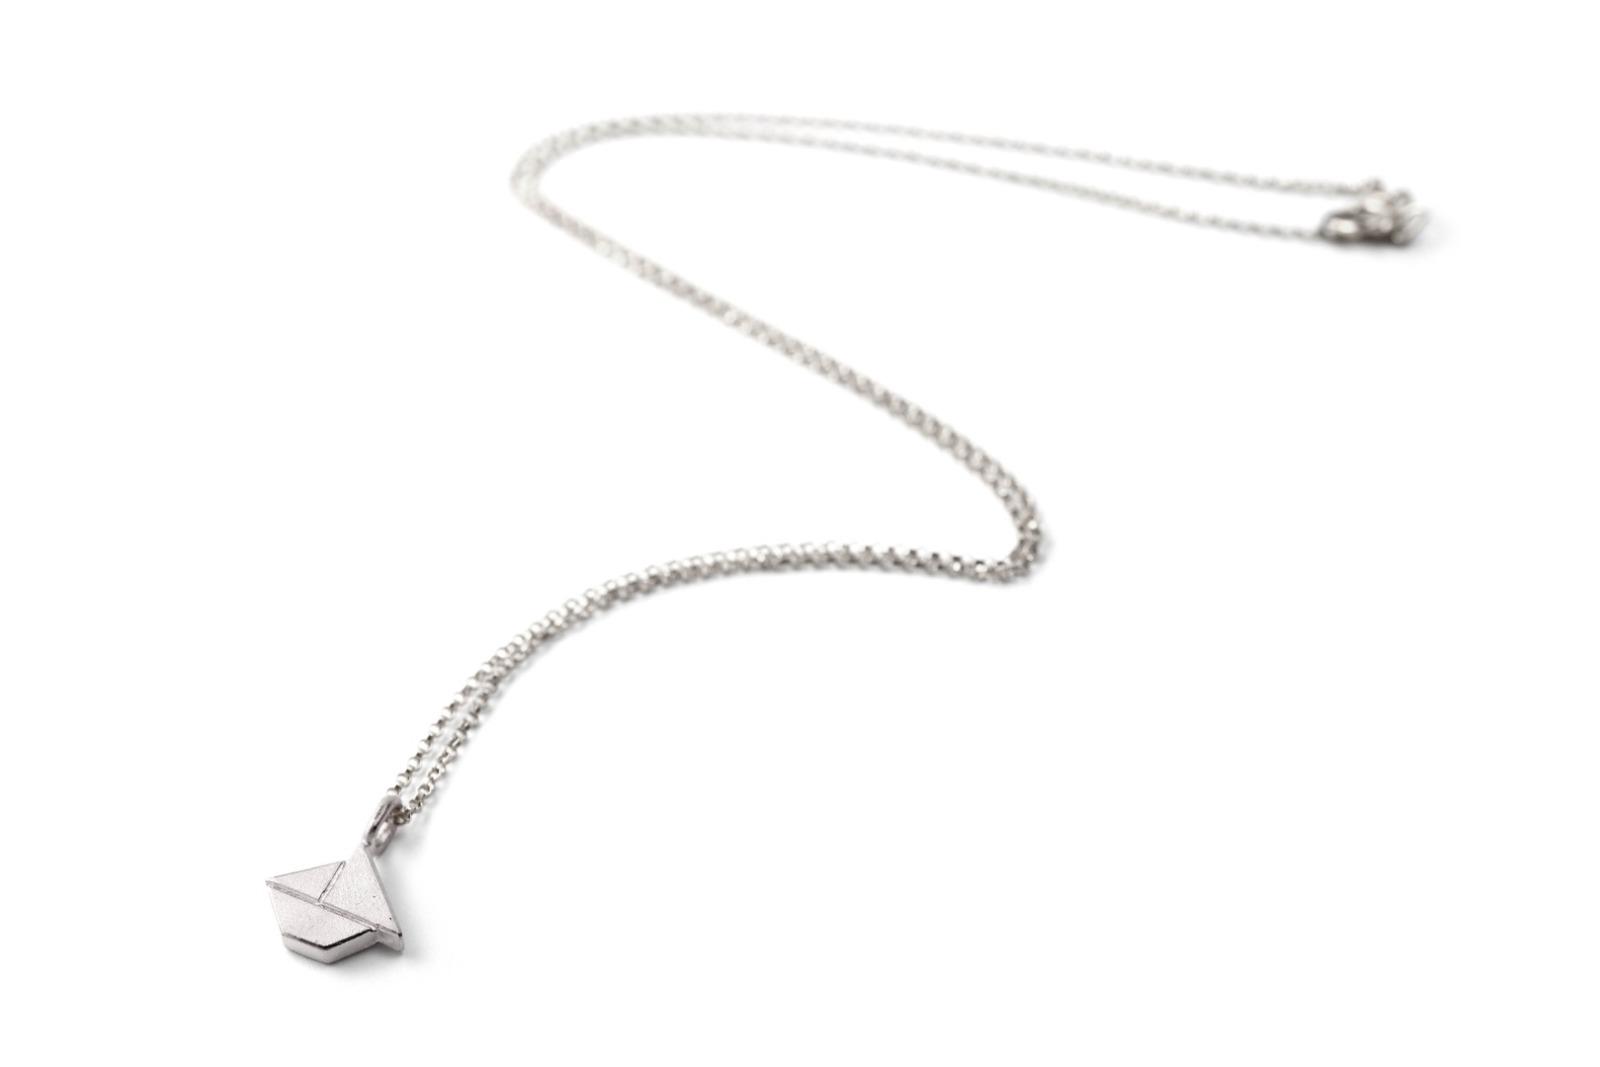 Tangram-Kette SCHIFFCHEN 925 Silber